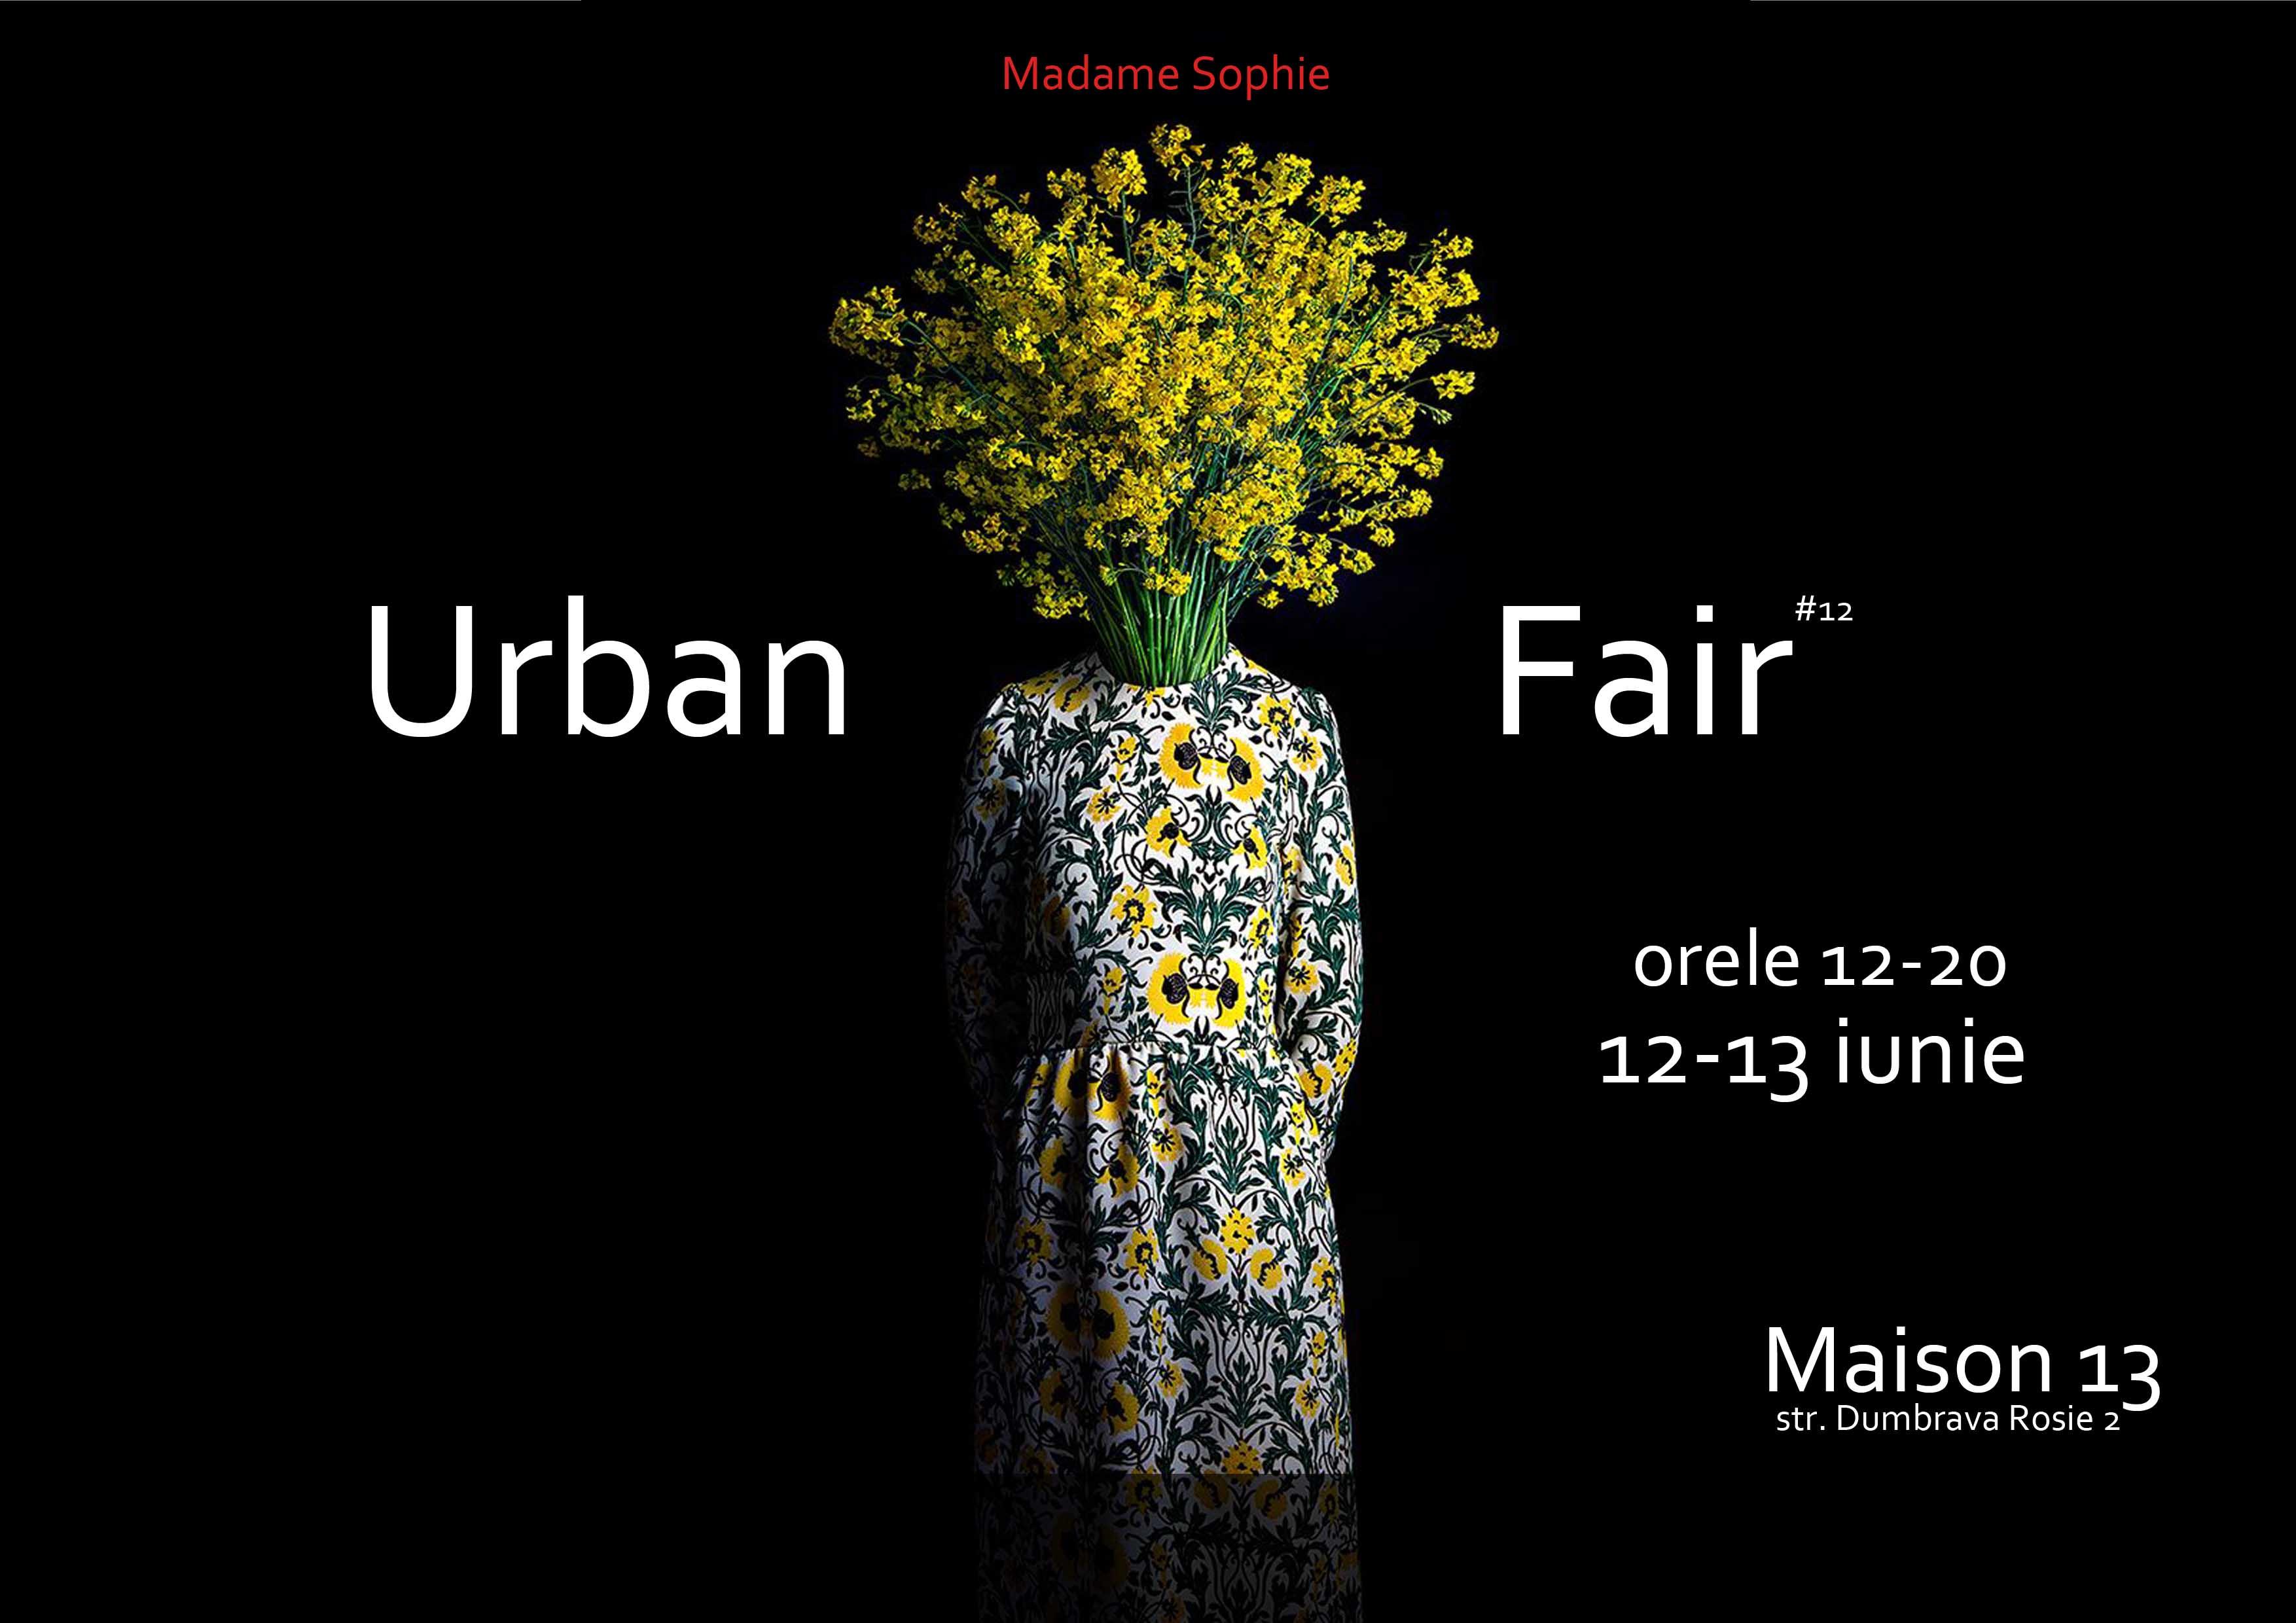 Urban Fair la Maison 13